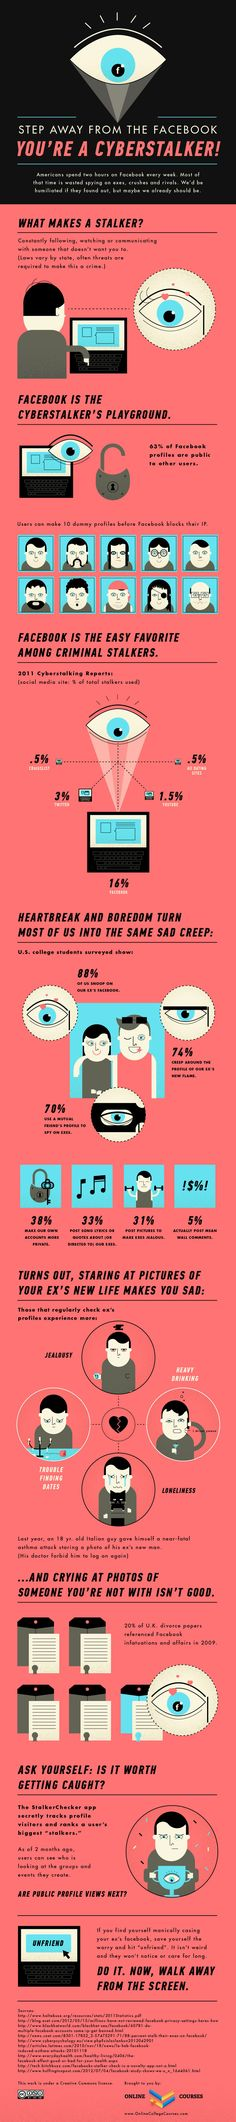 Facebook Stalking Statistics 2012 [Infographic]